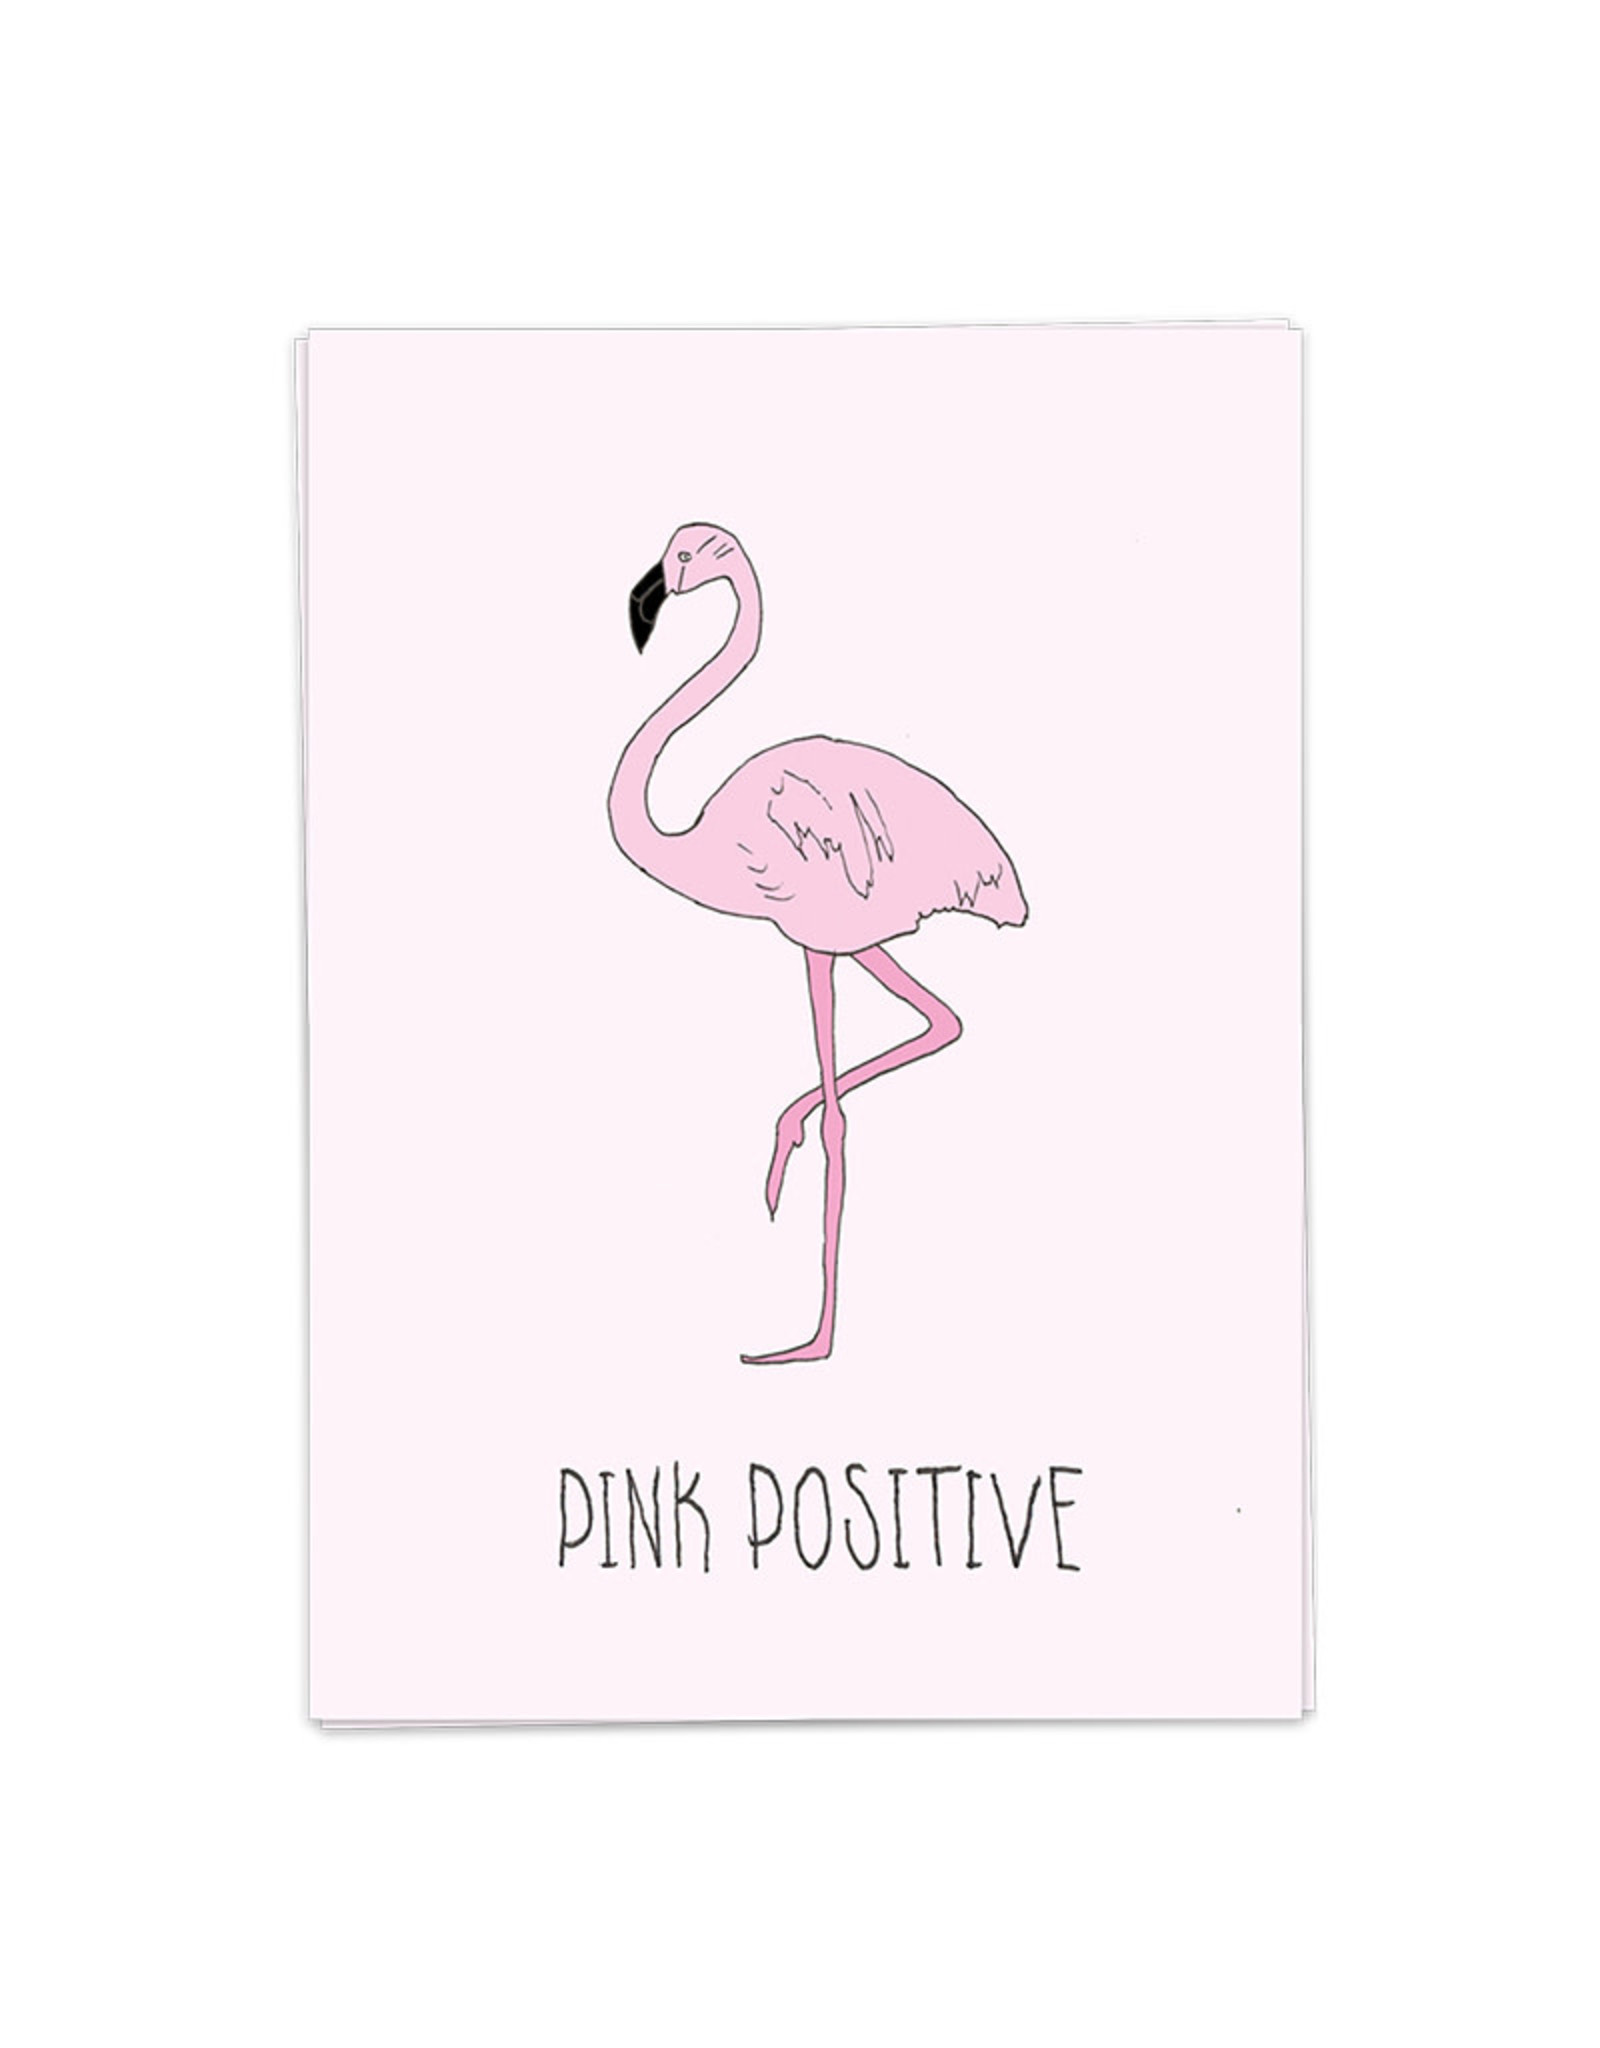 KAART BLANCHE KAART BLANCHE Pink Positive